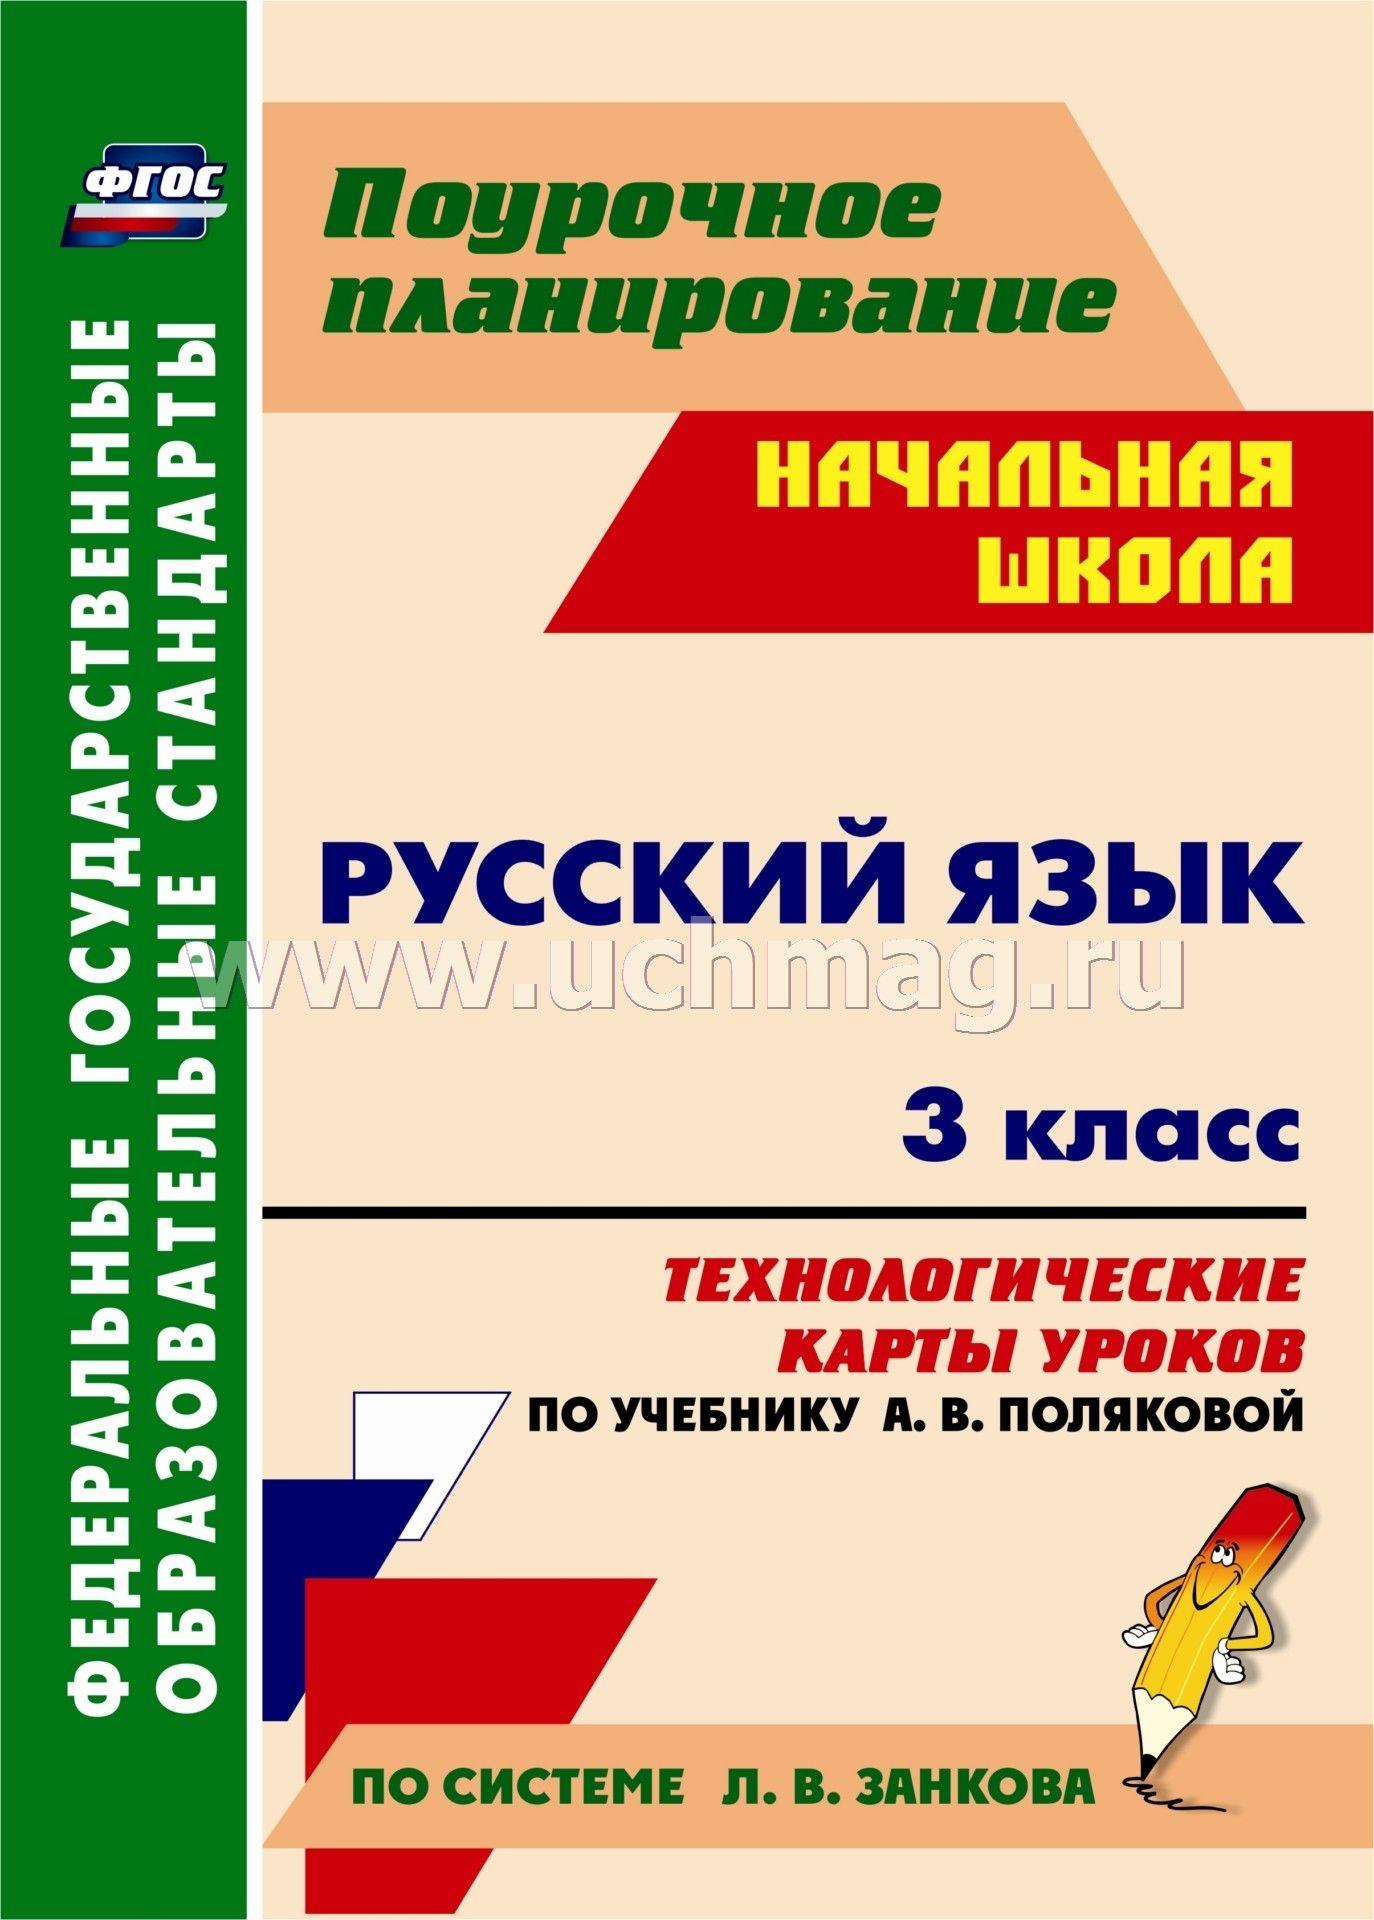 а.в.полякова 3 класс 2017 с решением онлайн без регистрации